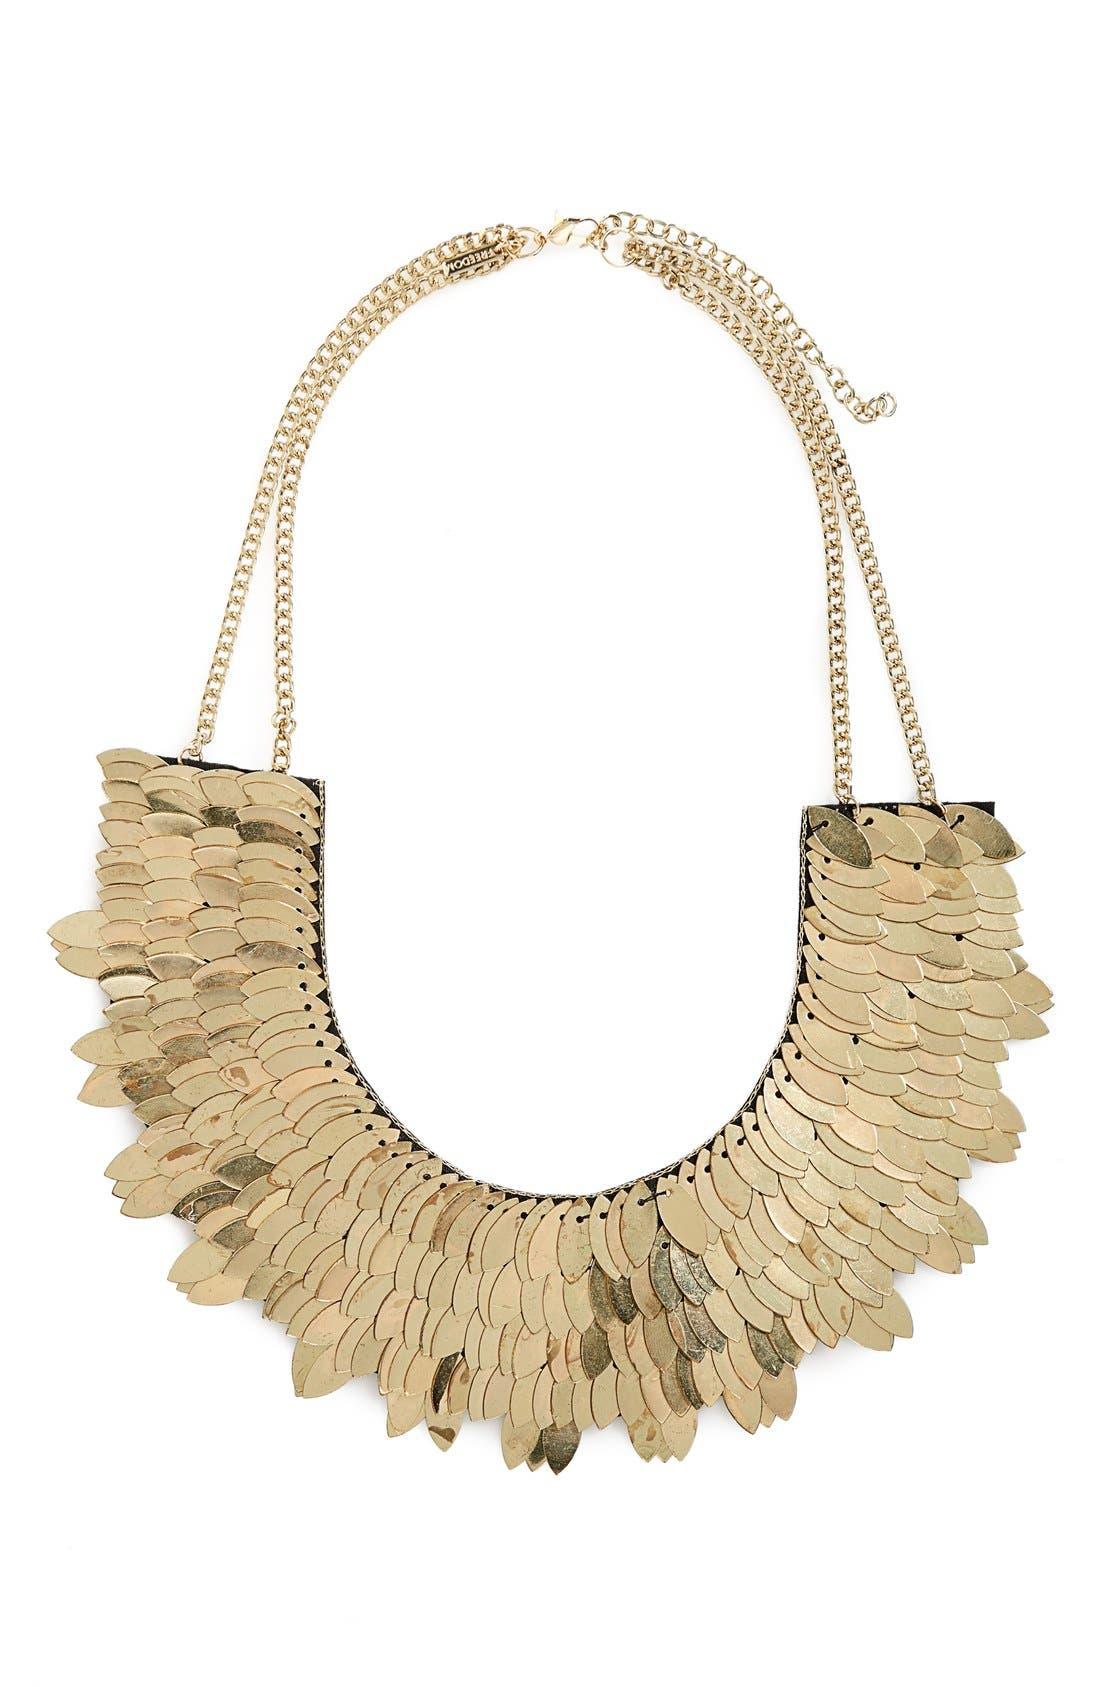 Main Image - Topshop Metallic Leaf Necklace